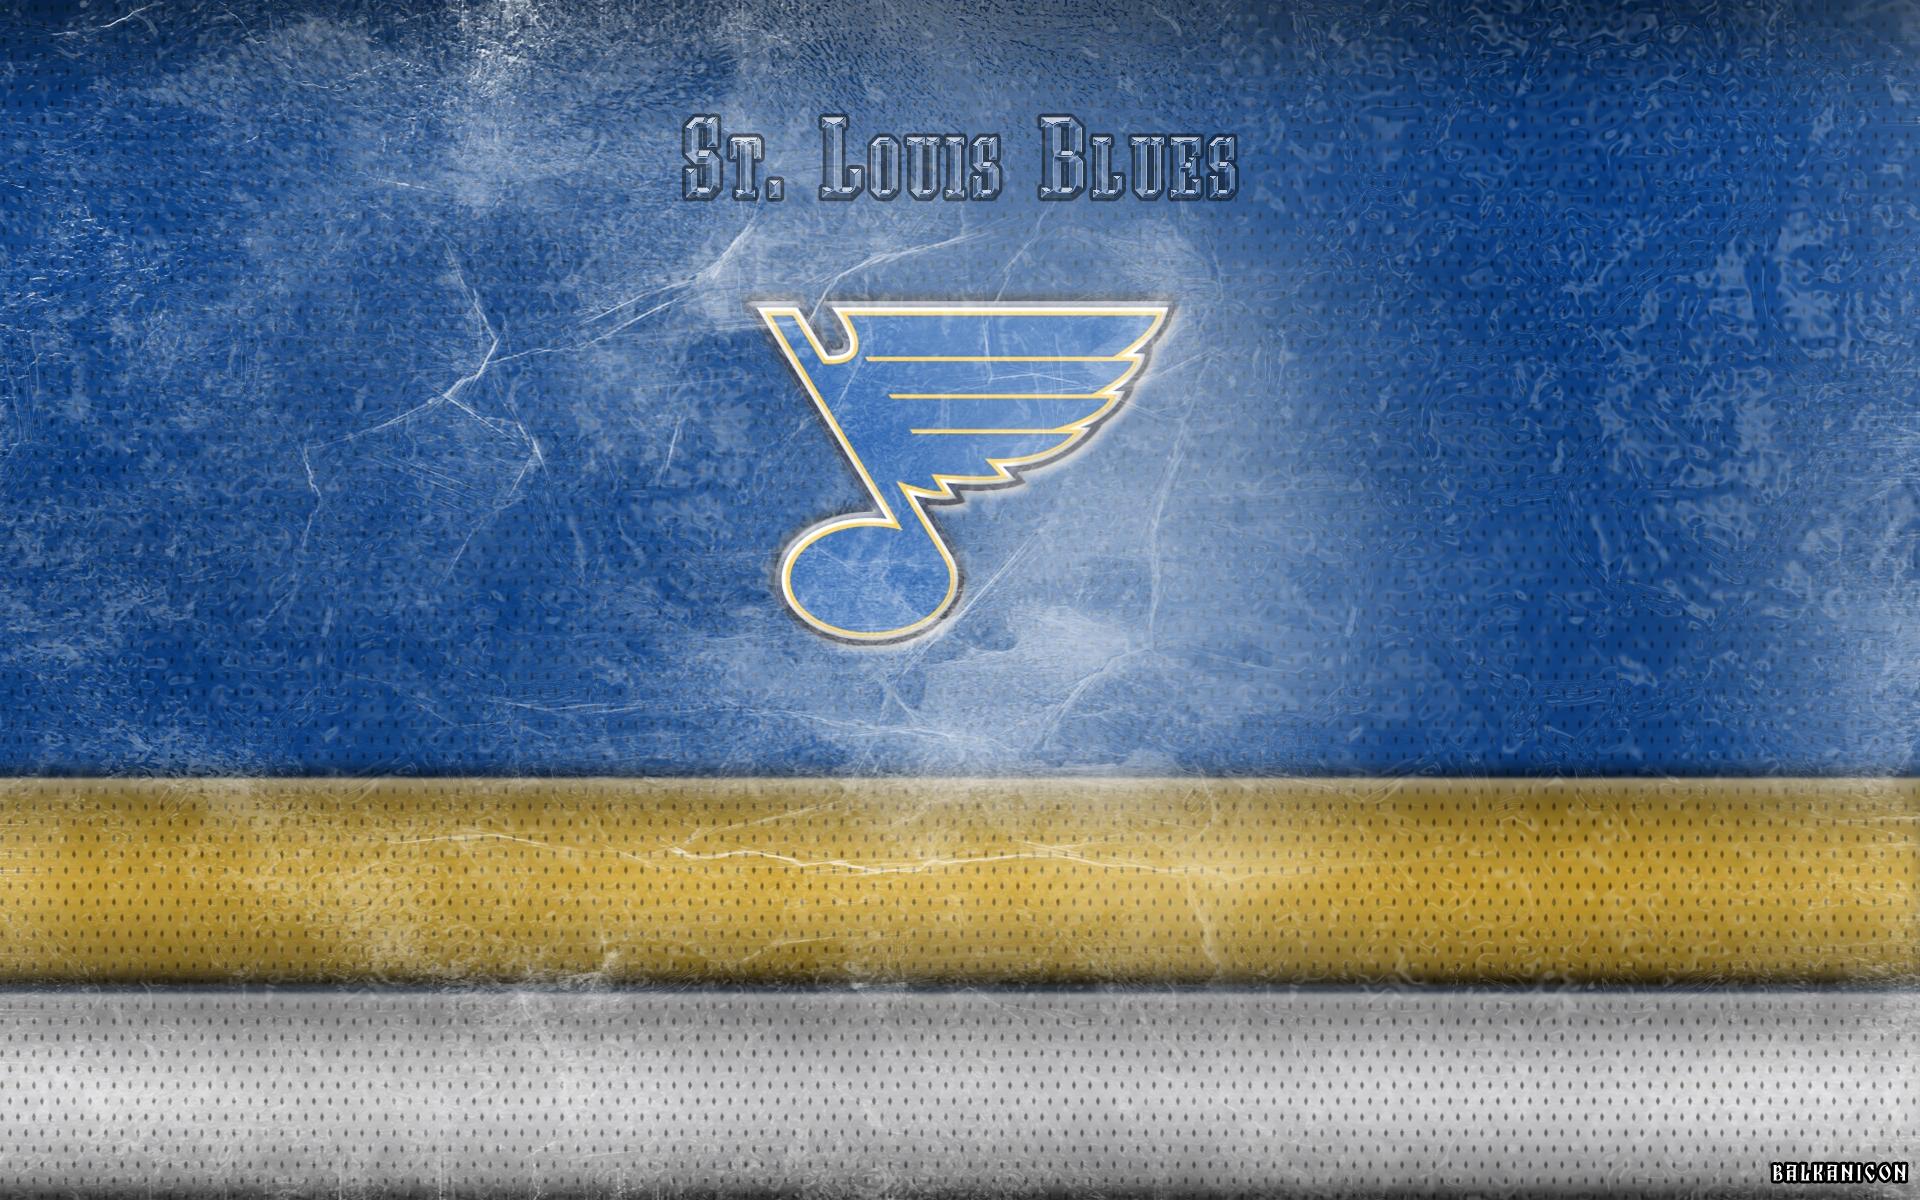 St Louis Blues Wallpaper By Balkanicon On Deviantart